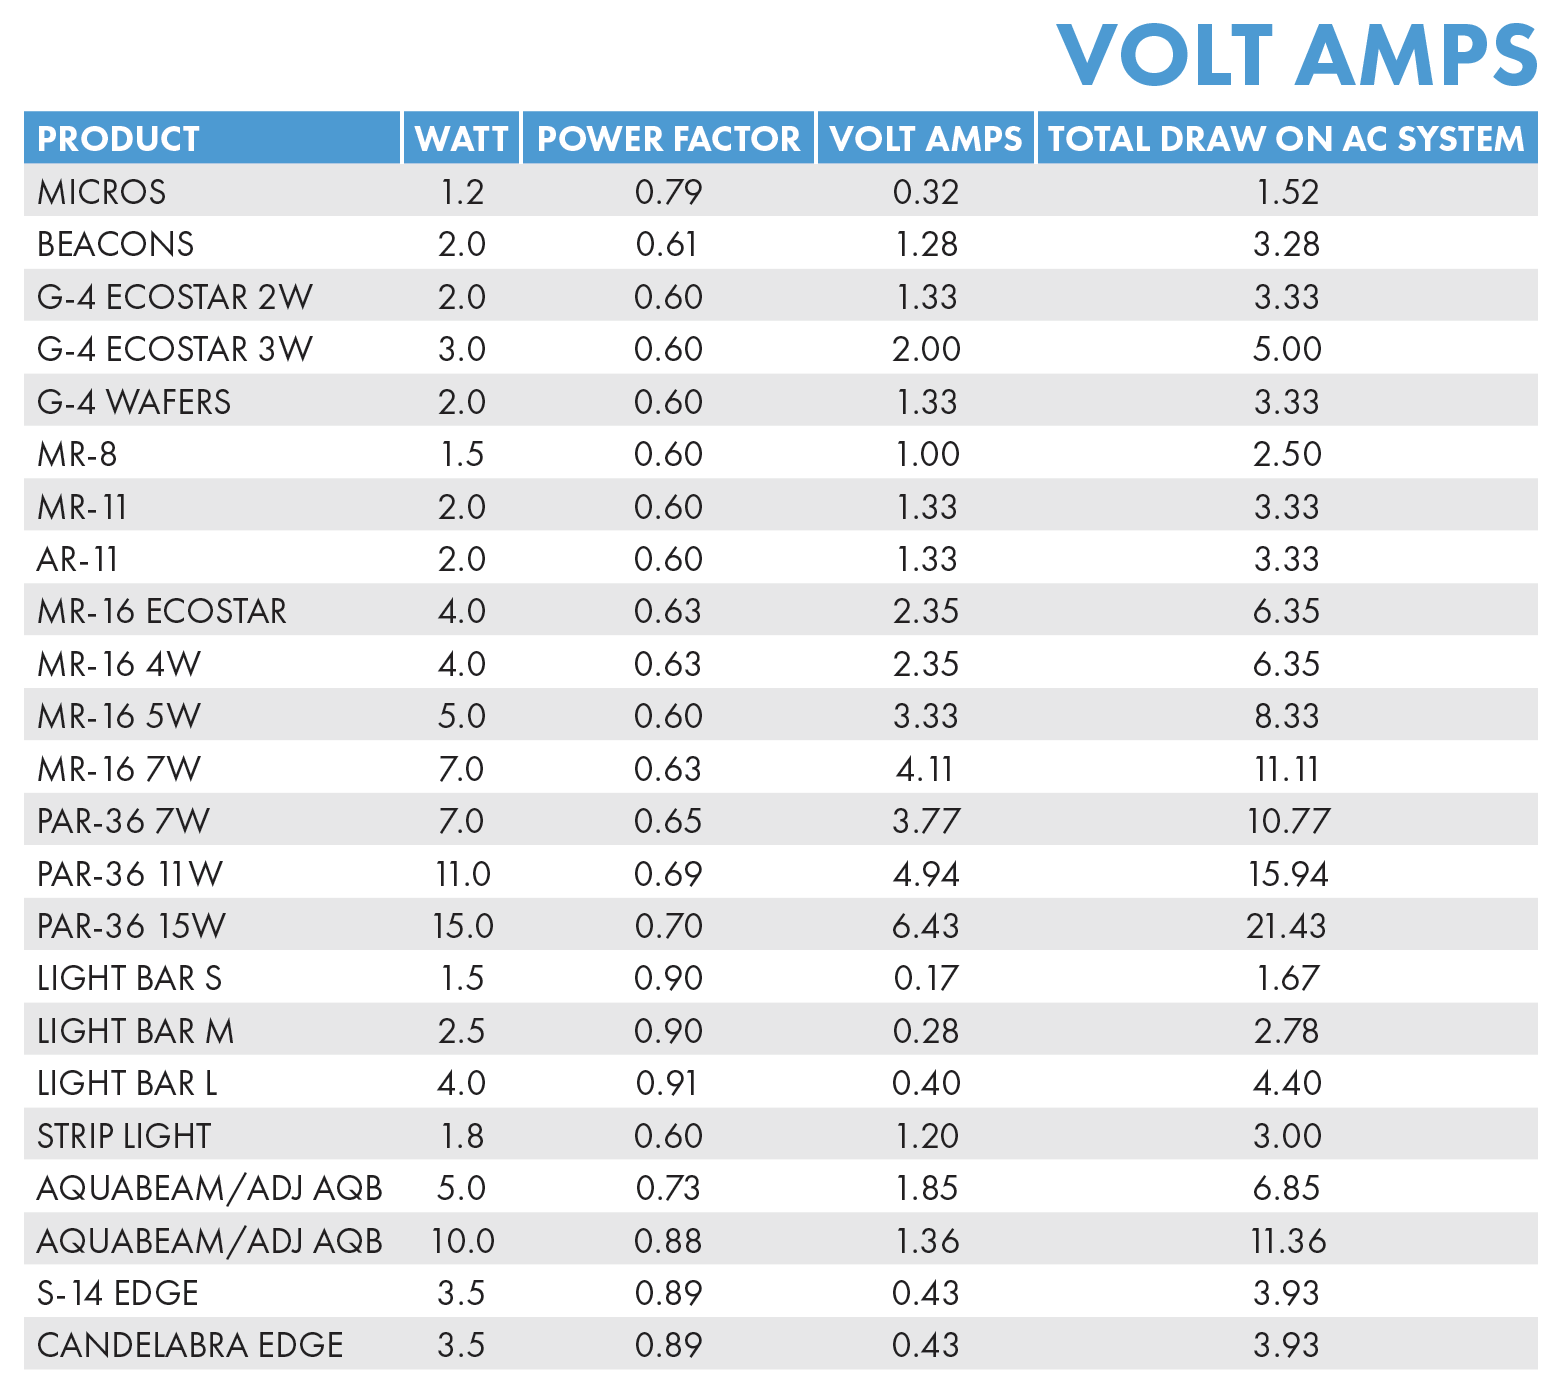 Beste Kupferdraht Amp Rating Diagramm Bilder - Elektrische ...